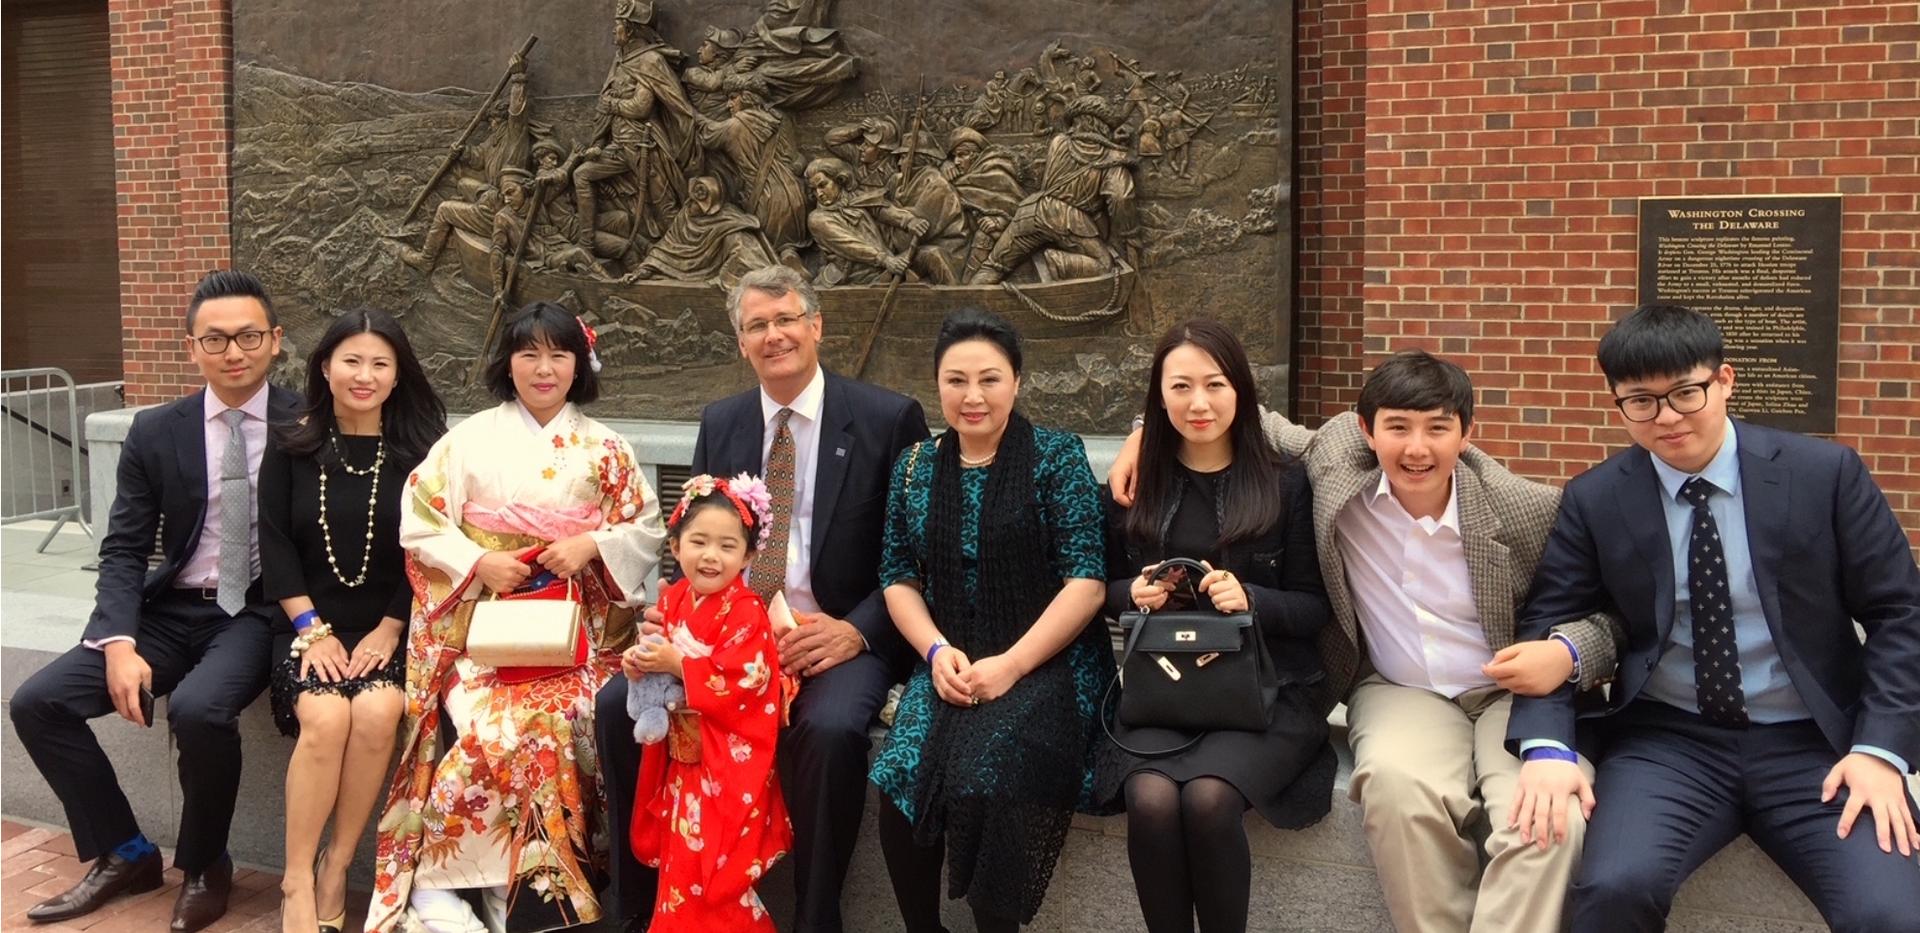 Ellen Qiongzhao Schicktanz and family